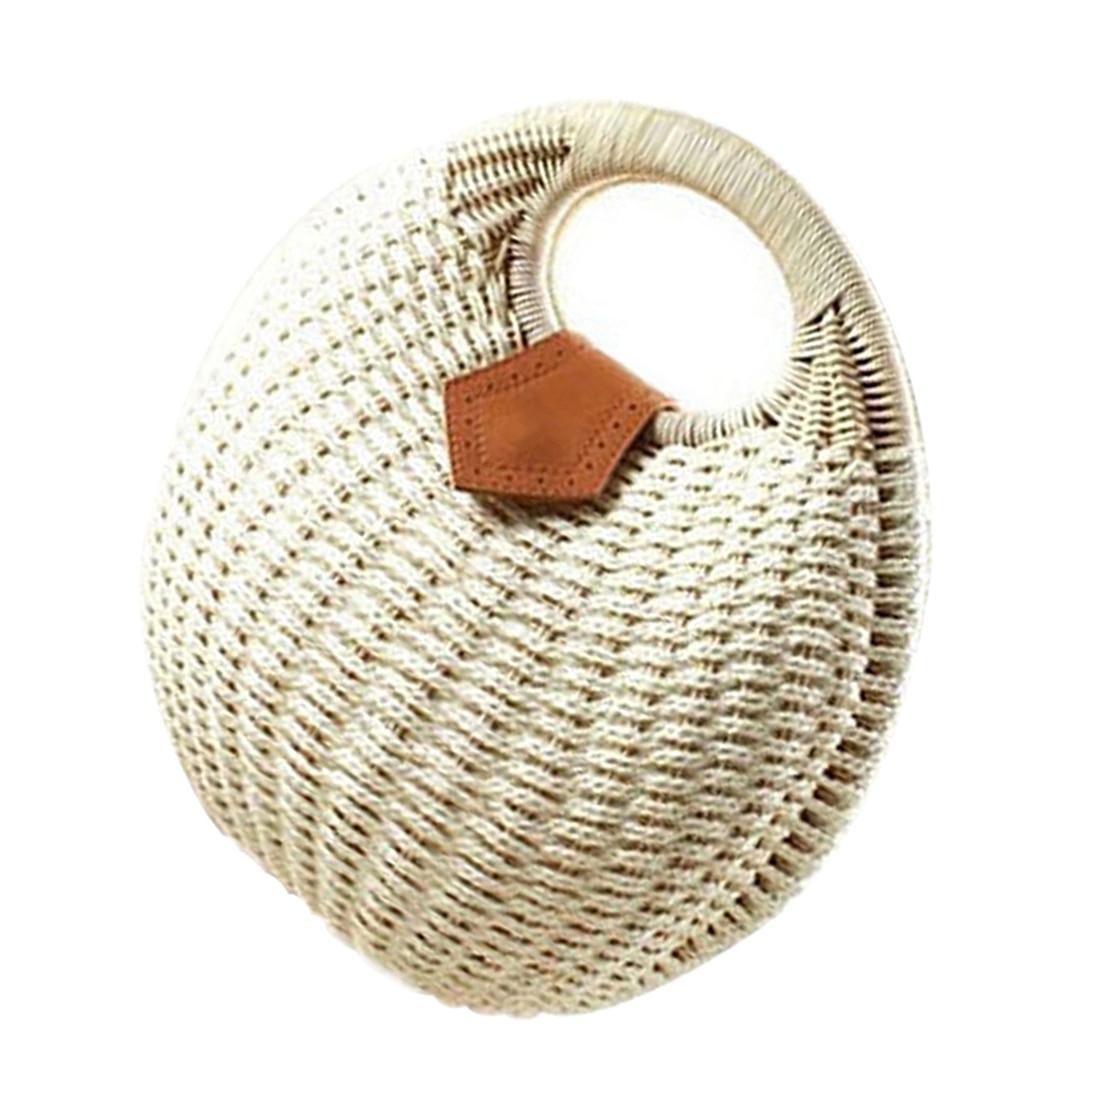 FGGS-Snails Nest Tote Handbag Summer Beach Bags Woman Straw Bags Womens Handbag Rattan Bag